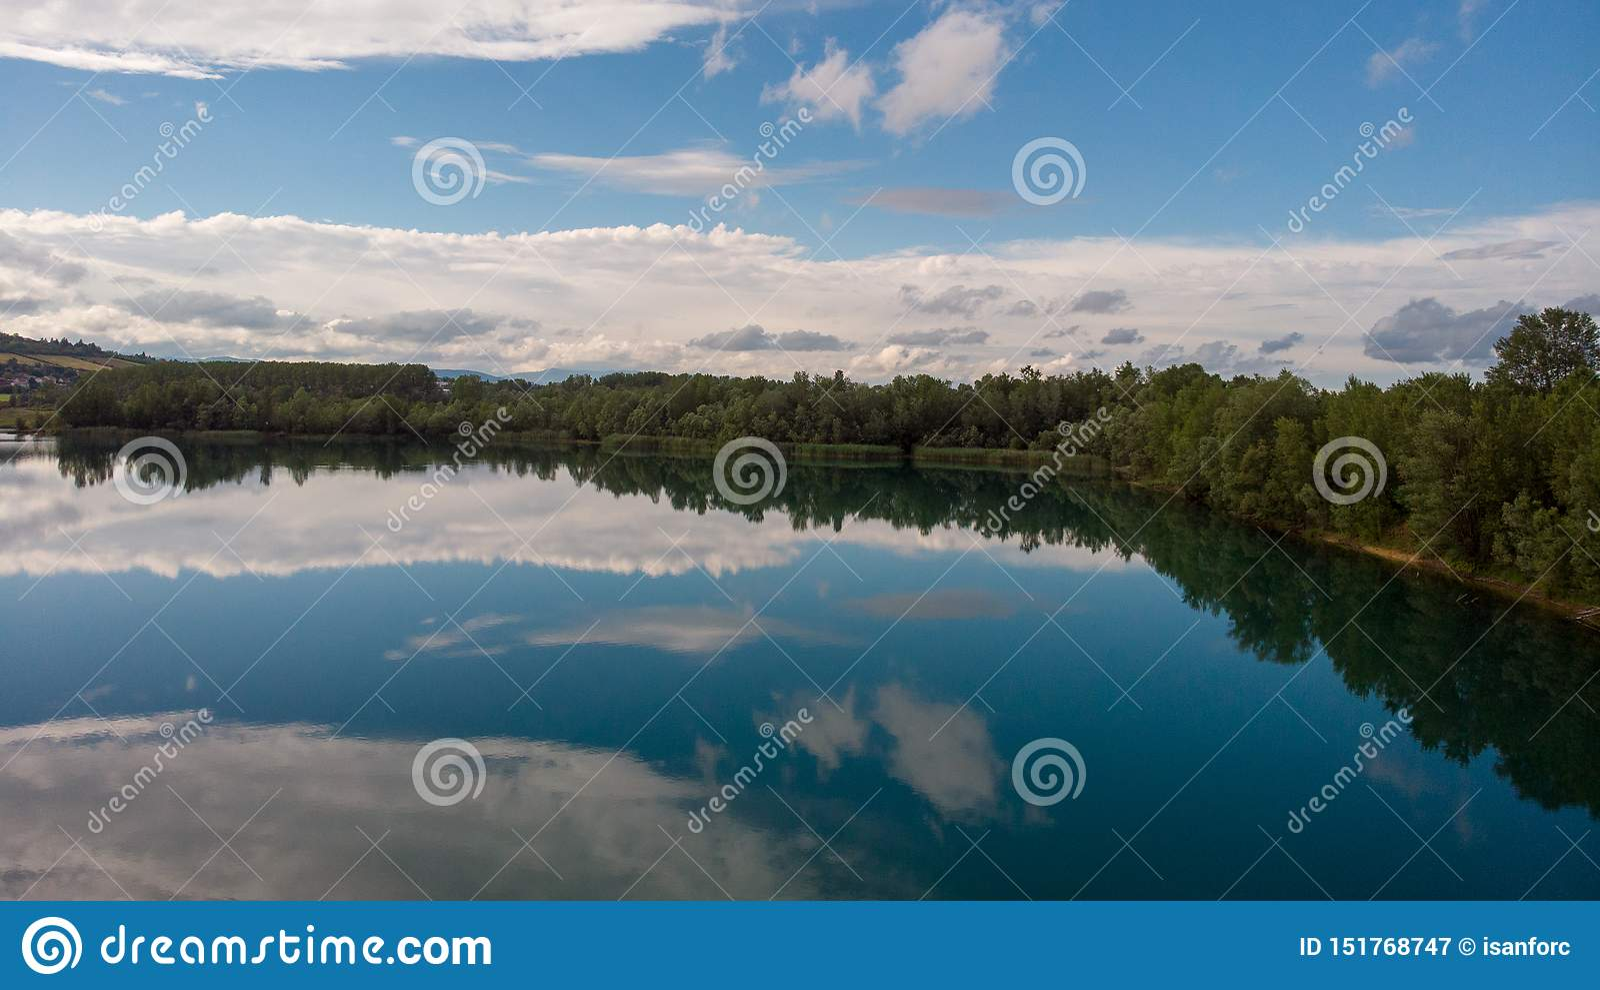 Wonderfull lake